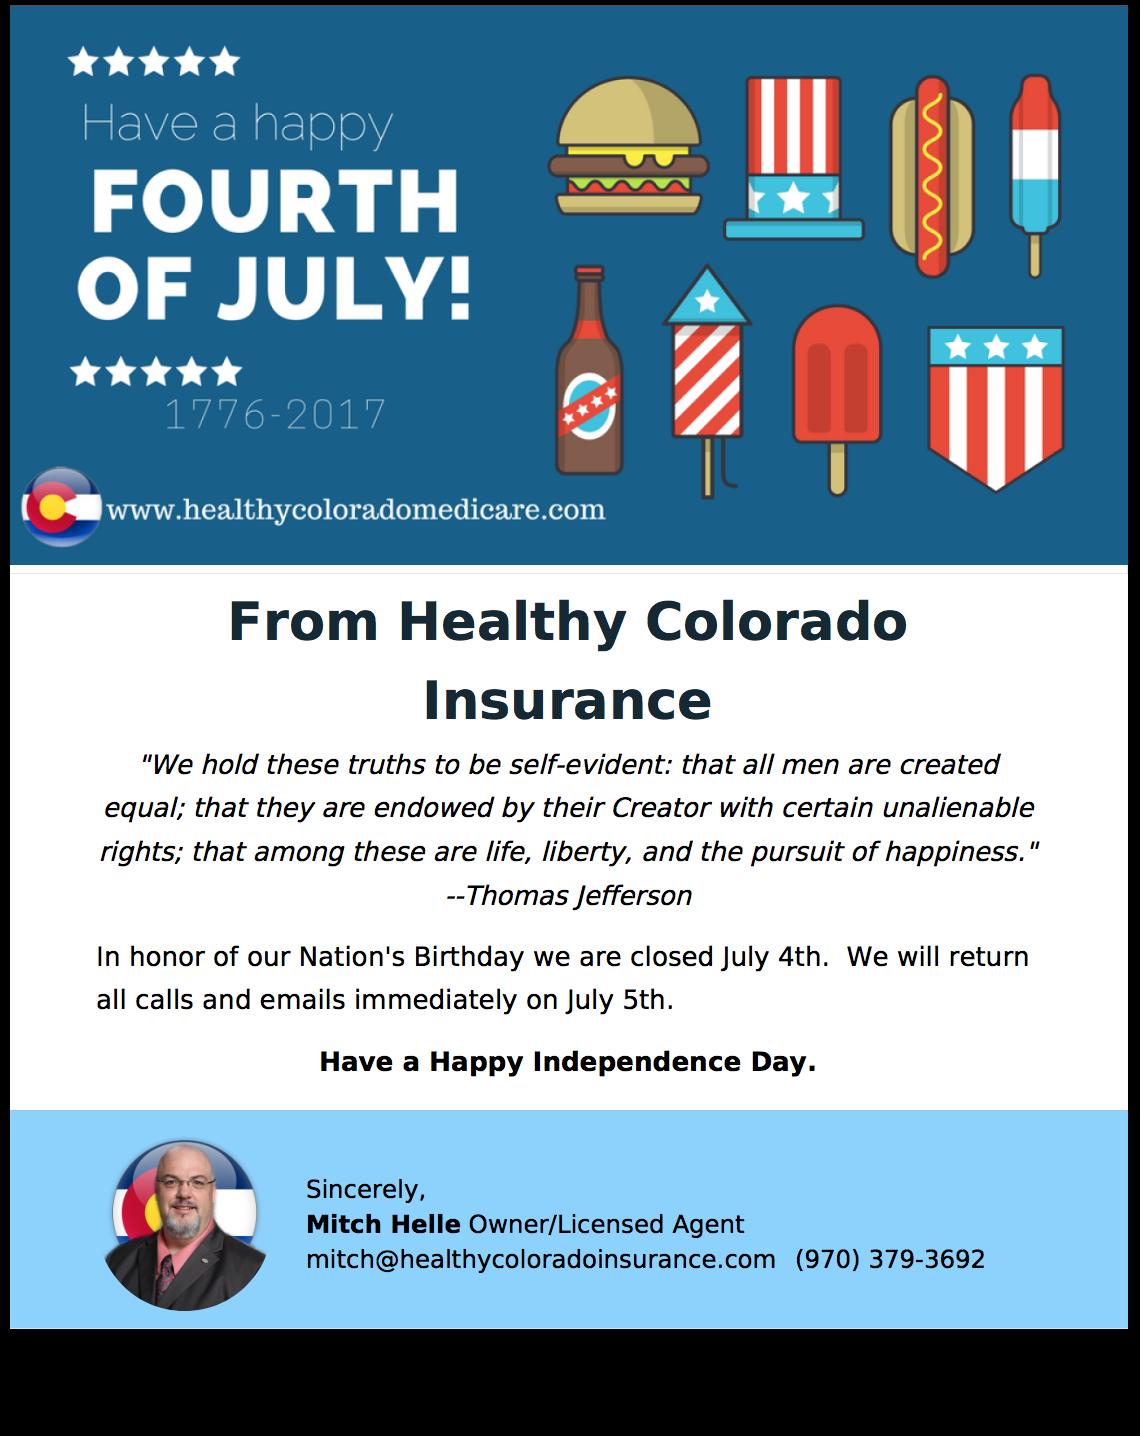 happyindependenceday from healthy colorado insurance